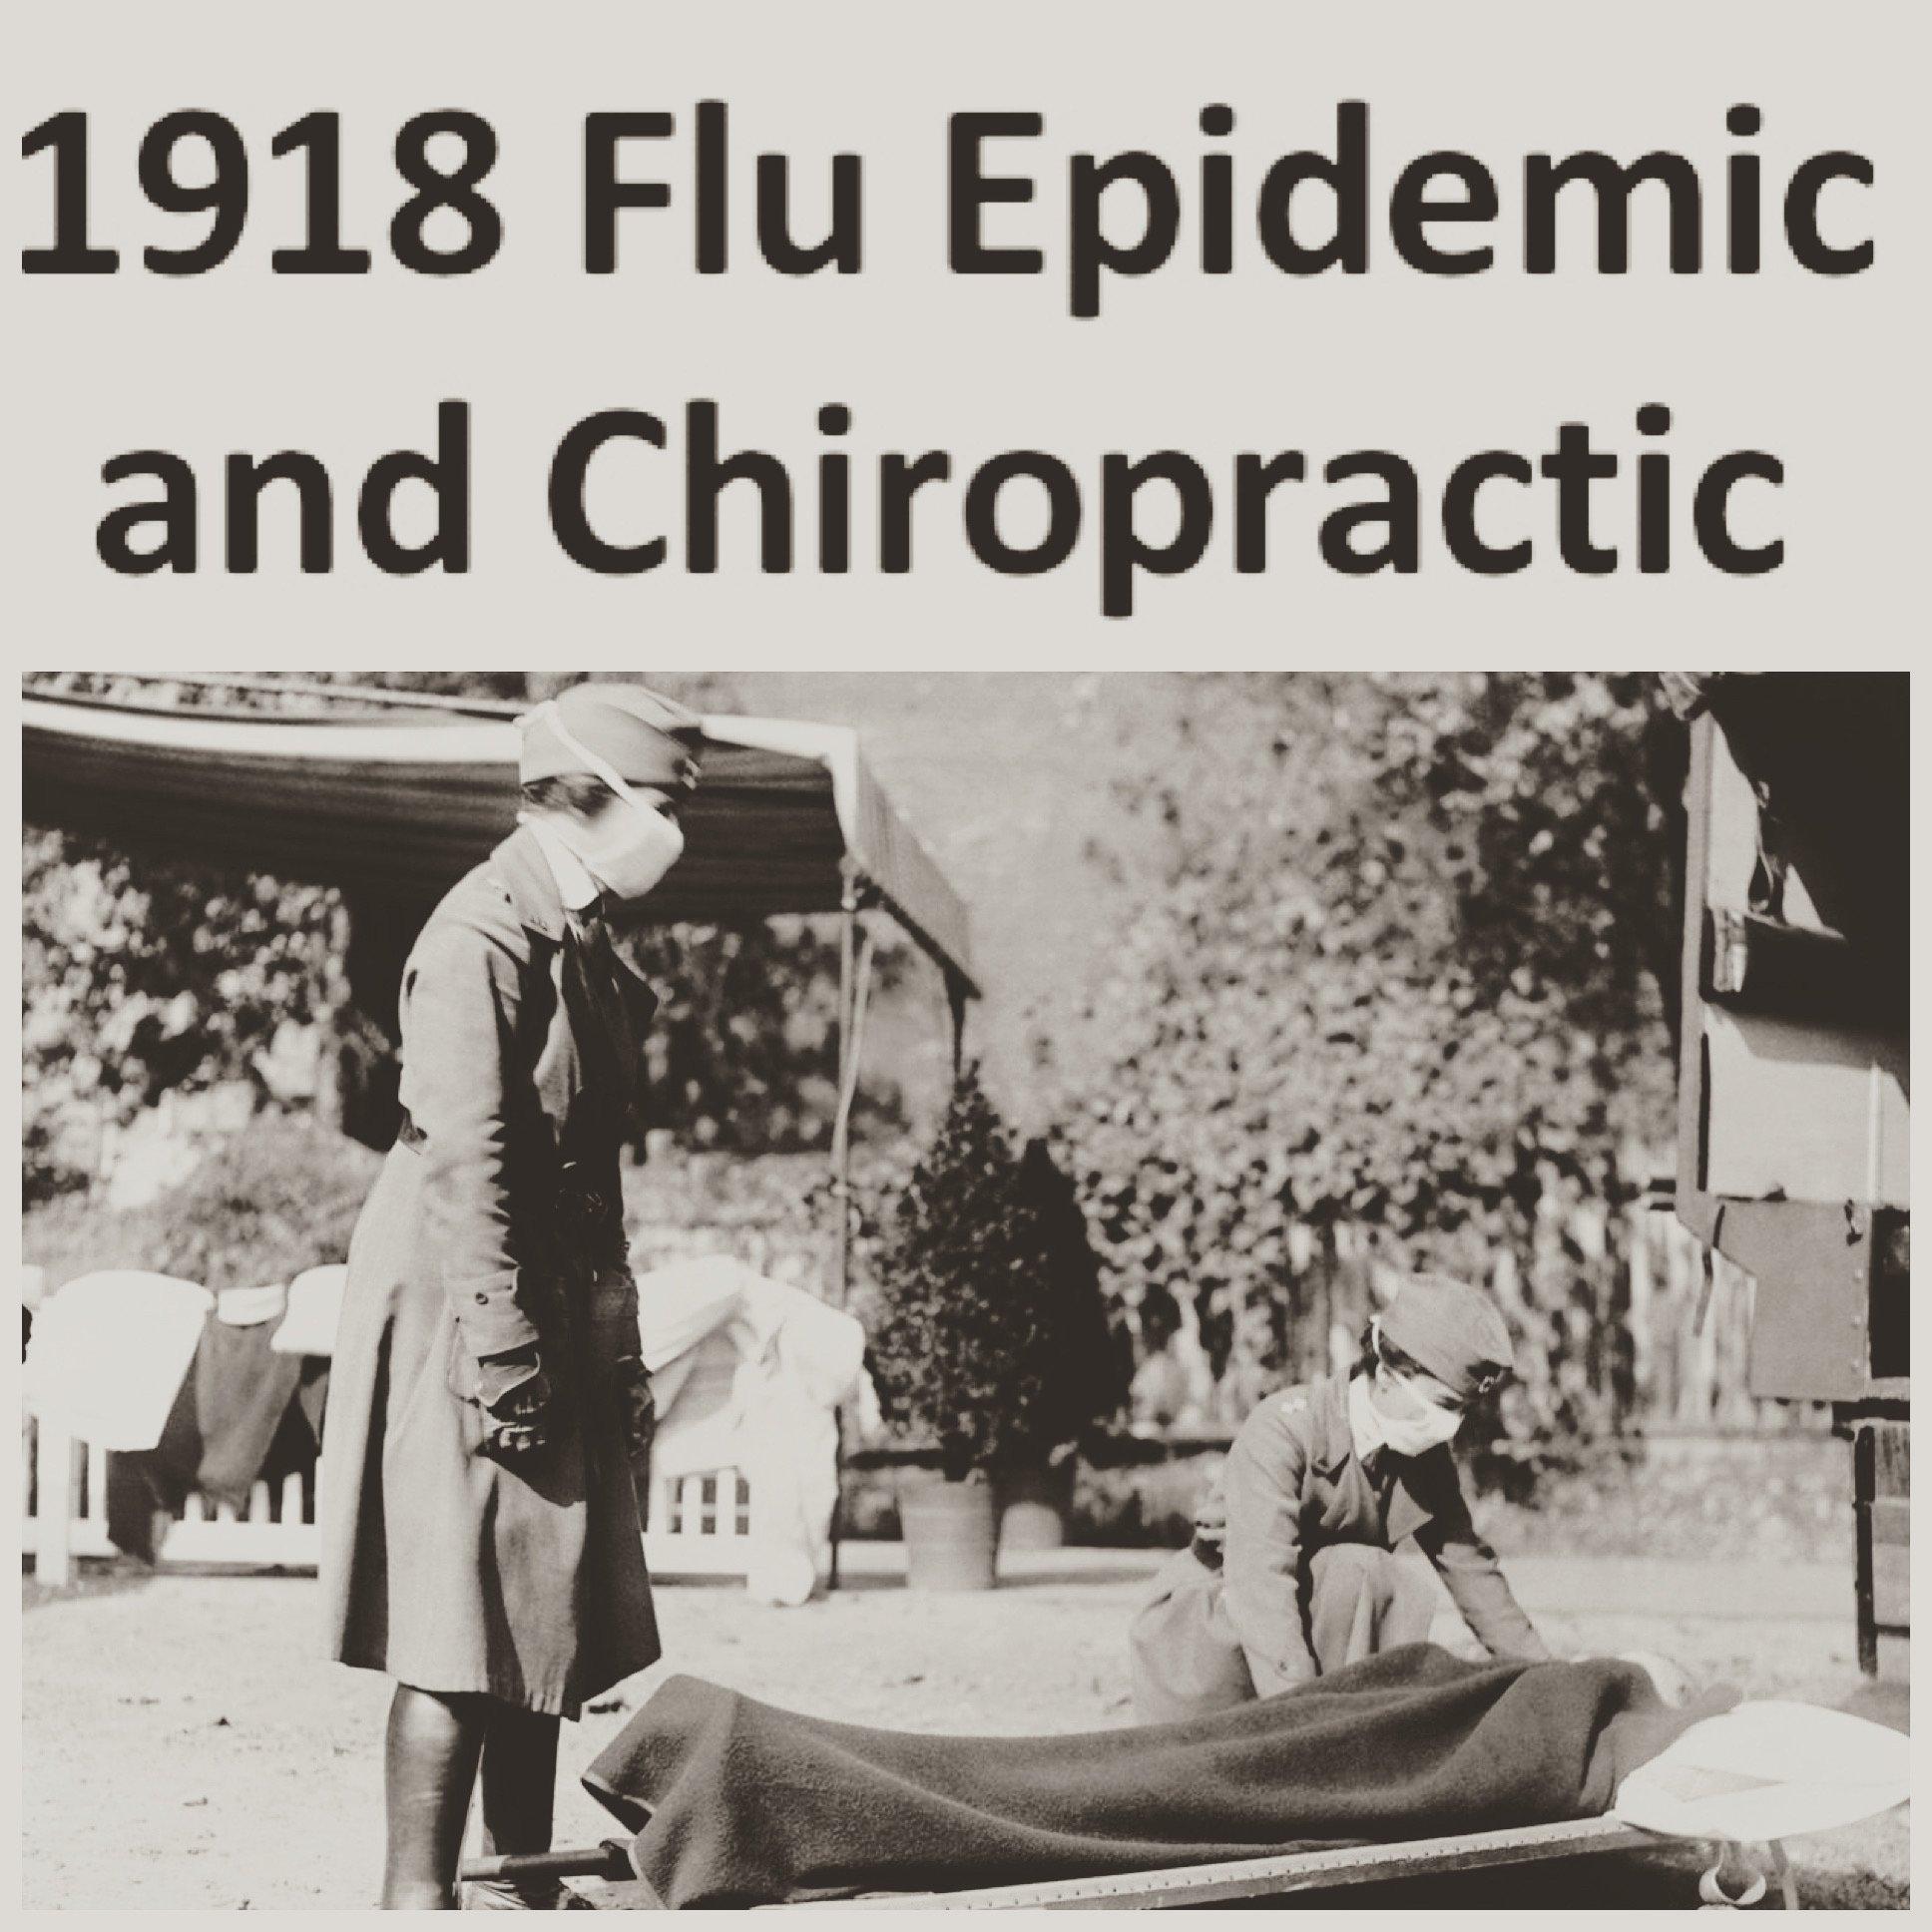 1918 Flu Pandemic+Chiropractic_JCNN